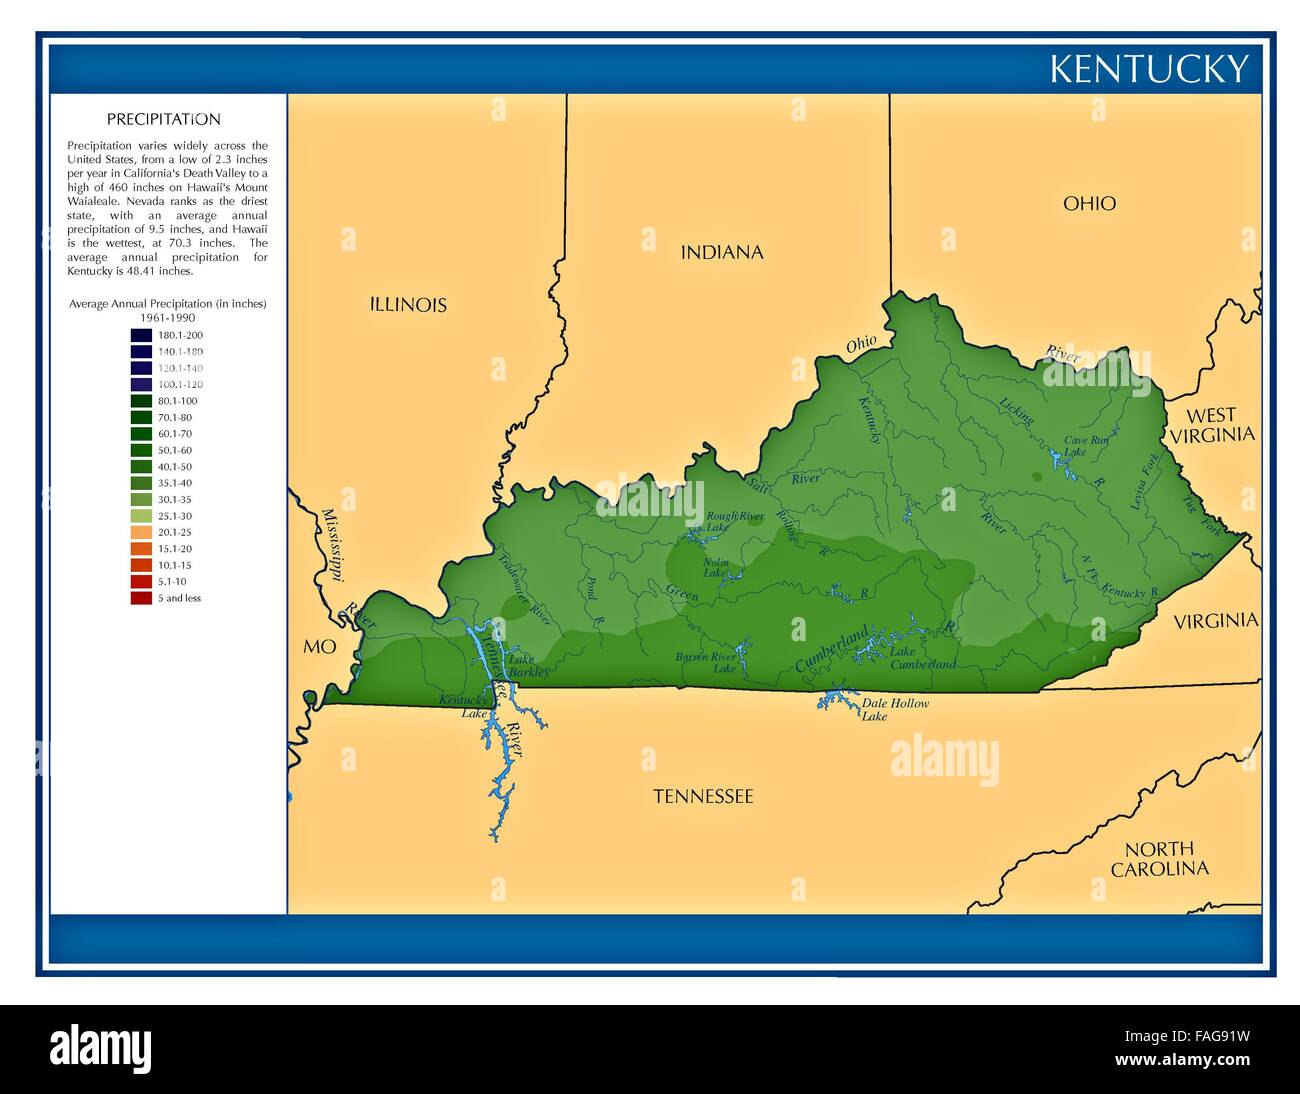 Kentucky State Capital River Stock Photos & Kentucky State Capital on colorado capitol map, frankfort map, rupp arena map, missouri capitol map, kentucky state bird, kentucky usa map, university of virginia map, kentucky state university map, kentucky convention center map, kentucky state map with counties, kentucky state flag map, louisville kentucky map, massachusetts state house map, kentucky lake map, kentucky state travel map, kentucky state map printable, kentucky outline map, united states region map, kentucky state house map,